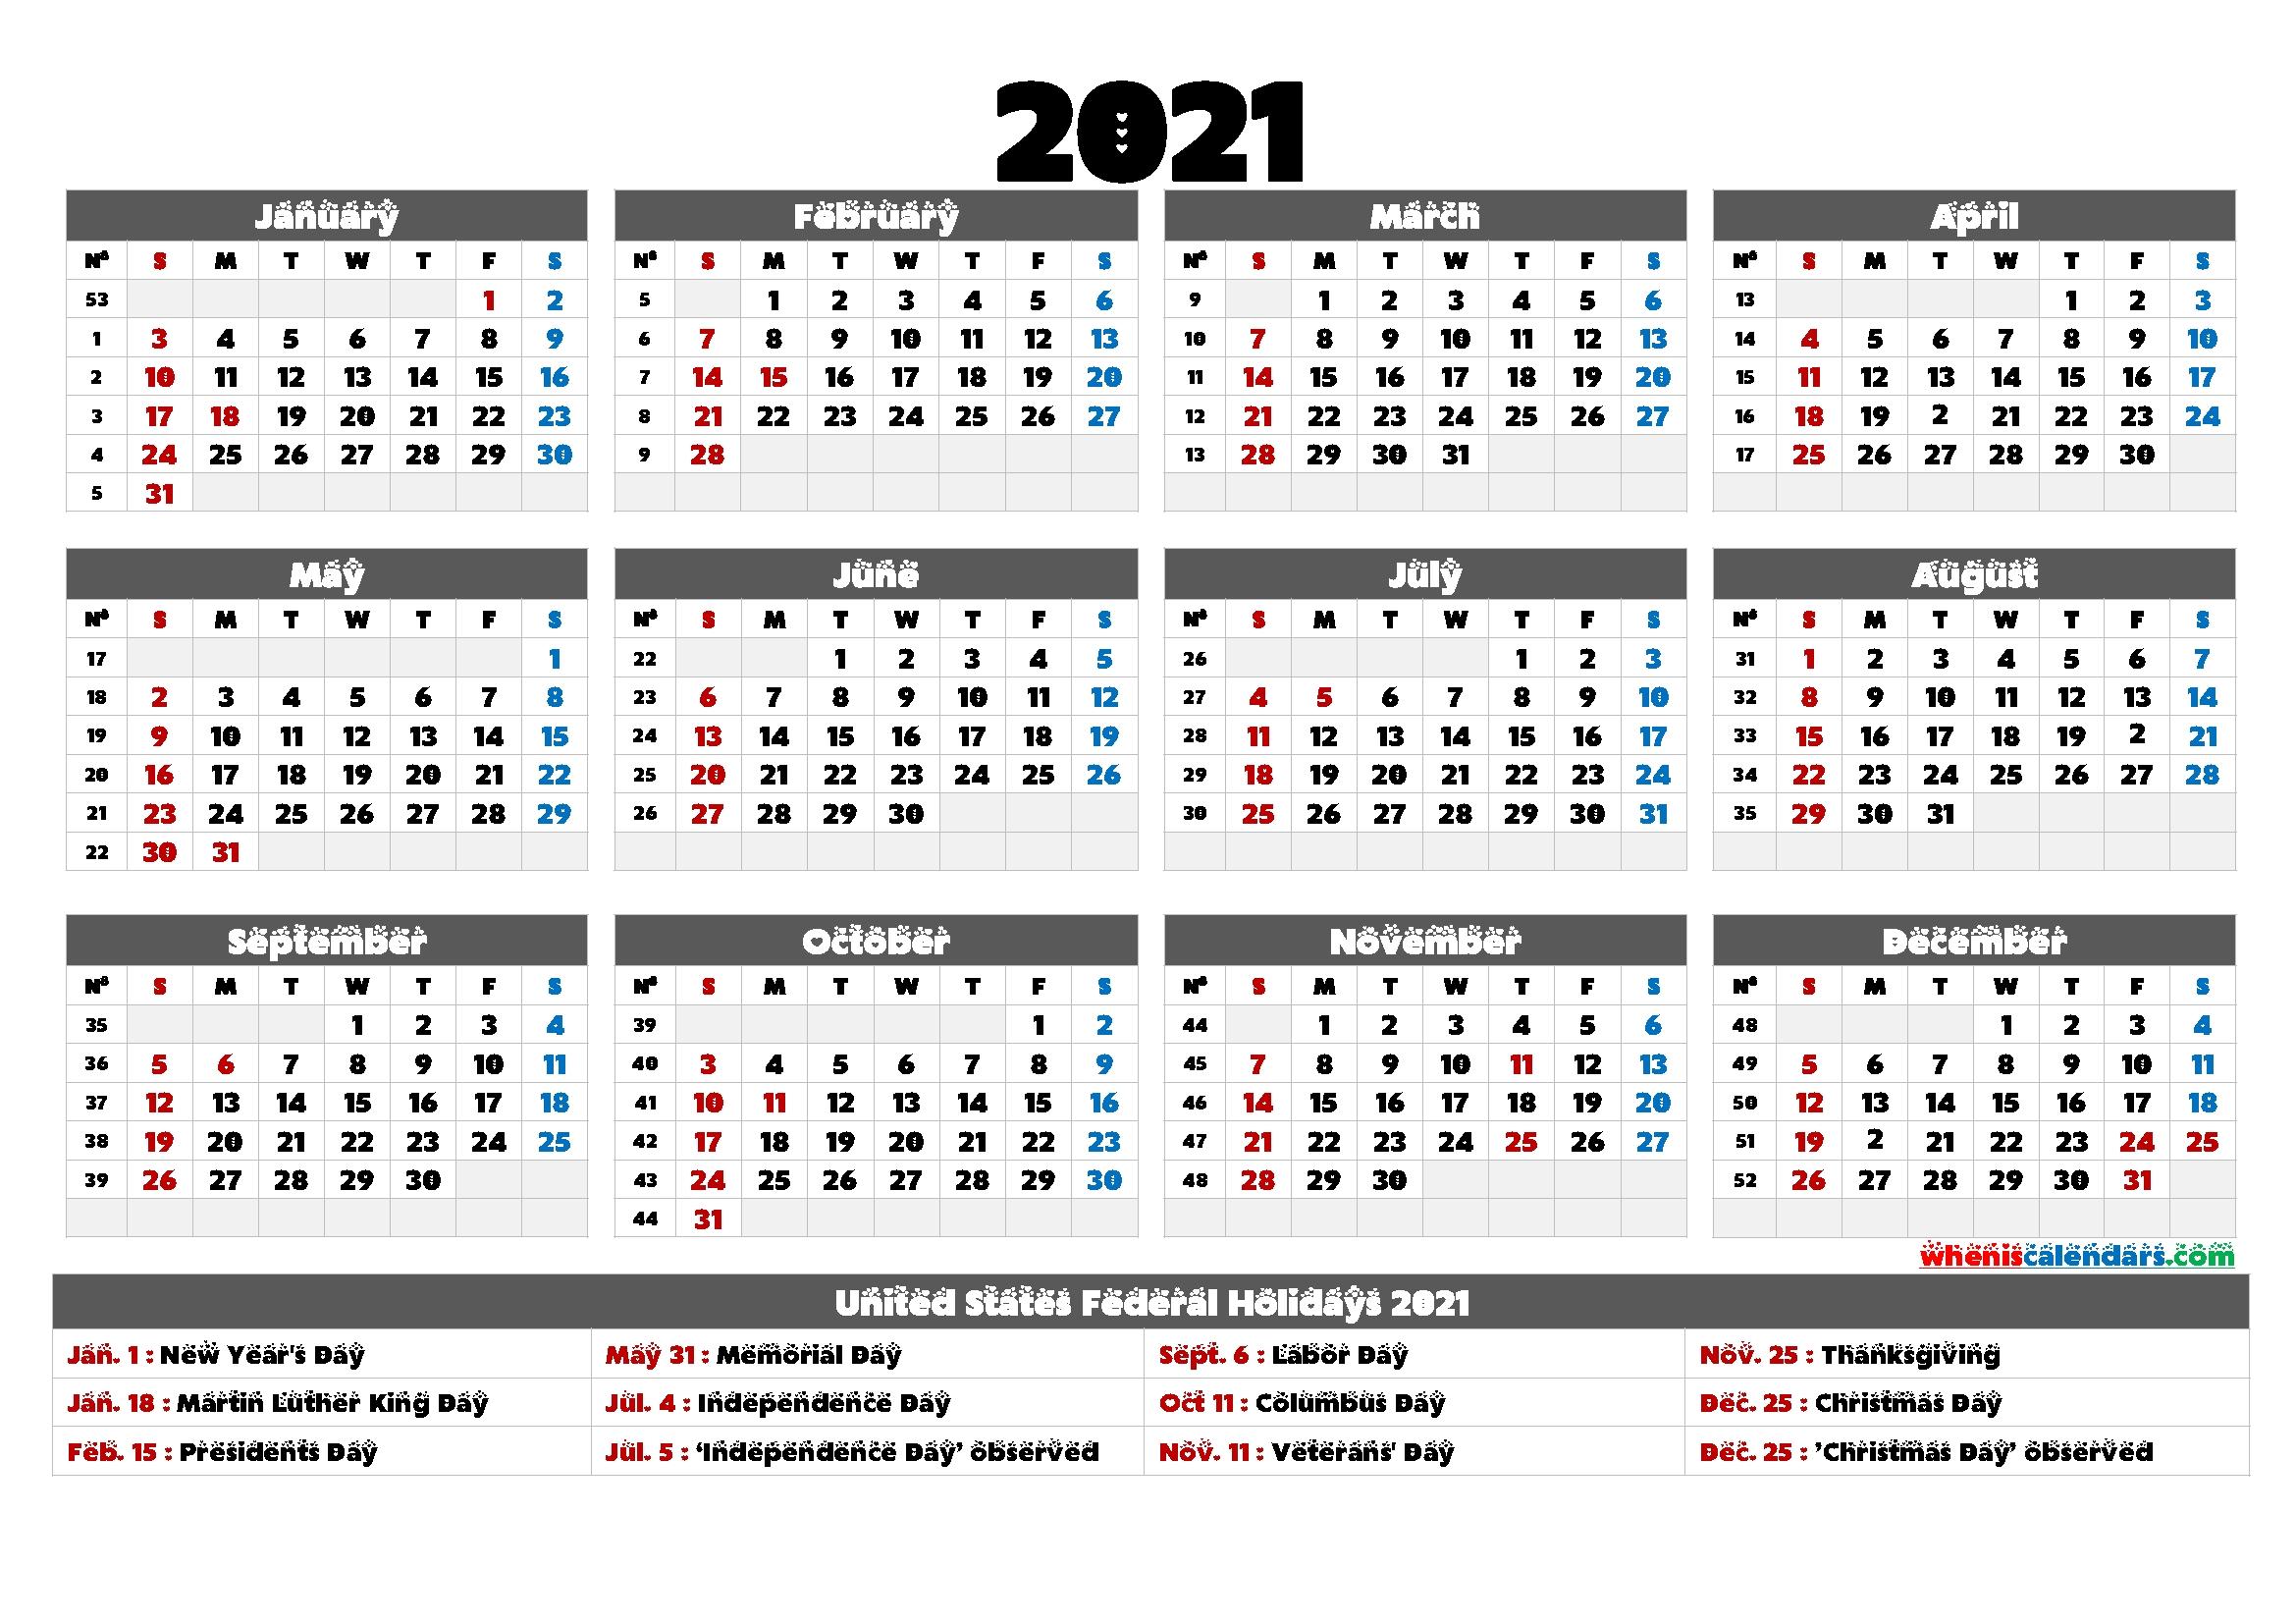 2021 Calendar With Holidays Printable - 6 Templates   Free Printable 2020 Calendar With Holidays Next Year August Calendar 2021